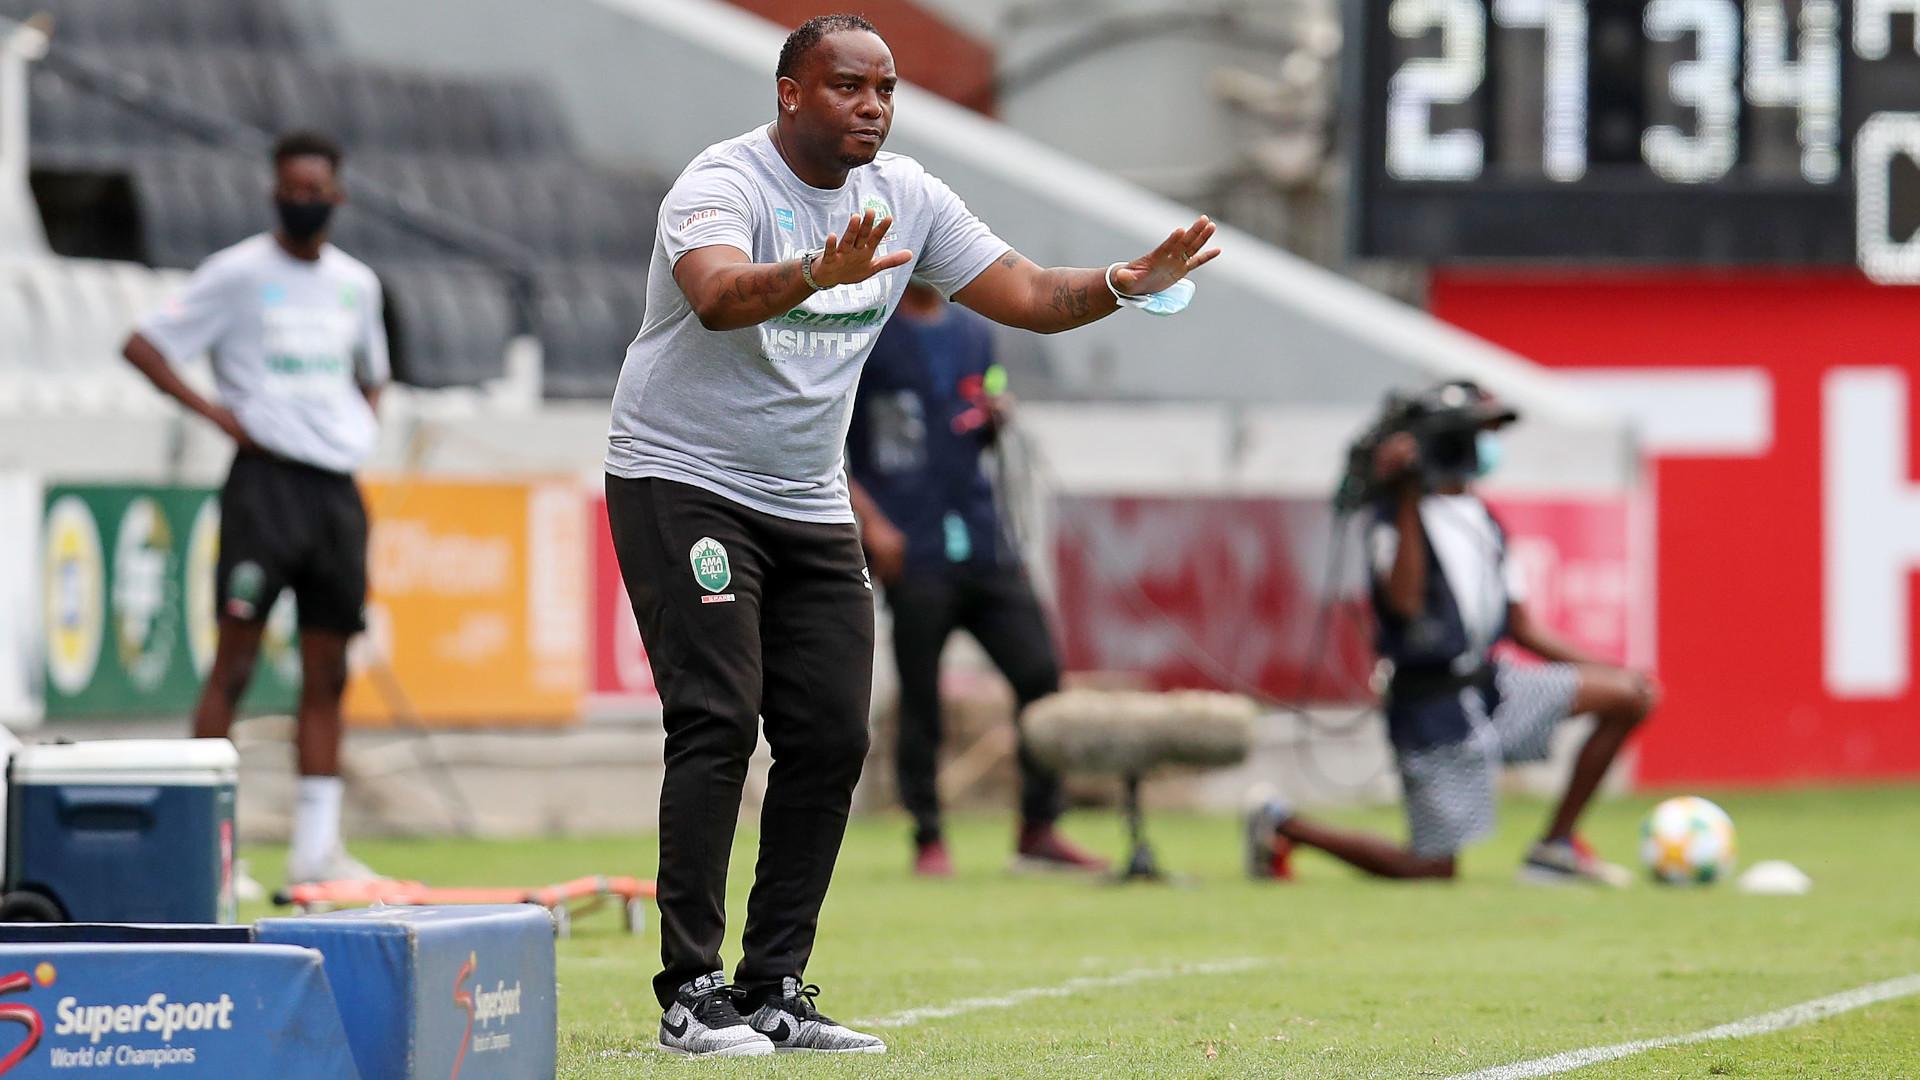 AmaZulu coach McCarthy expresses interest in vacant Bafana Bafana job